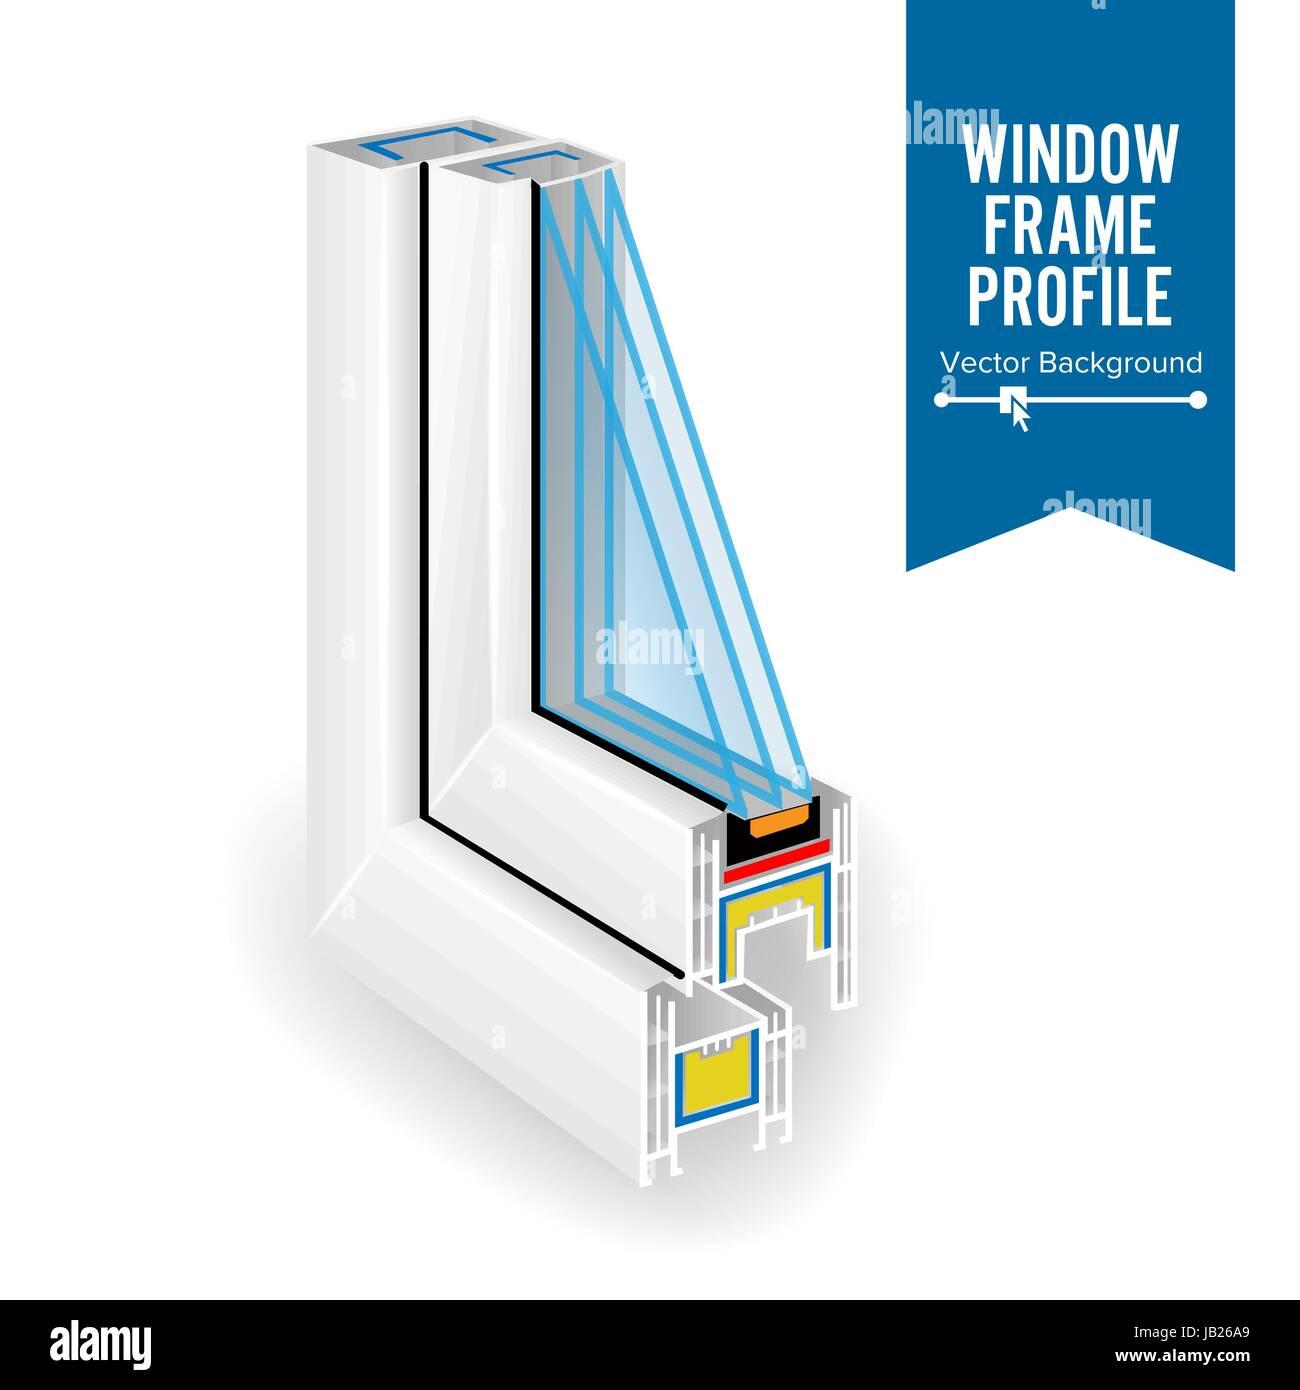 Energy-saving glass for plastic windows 86